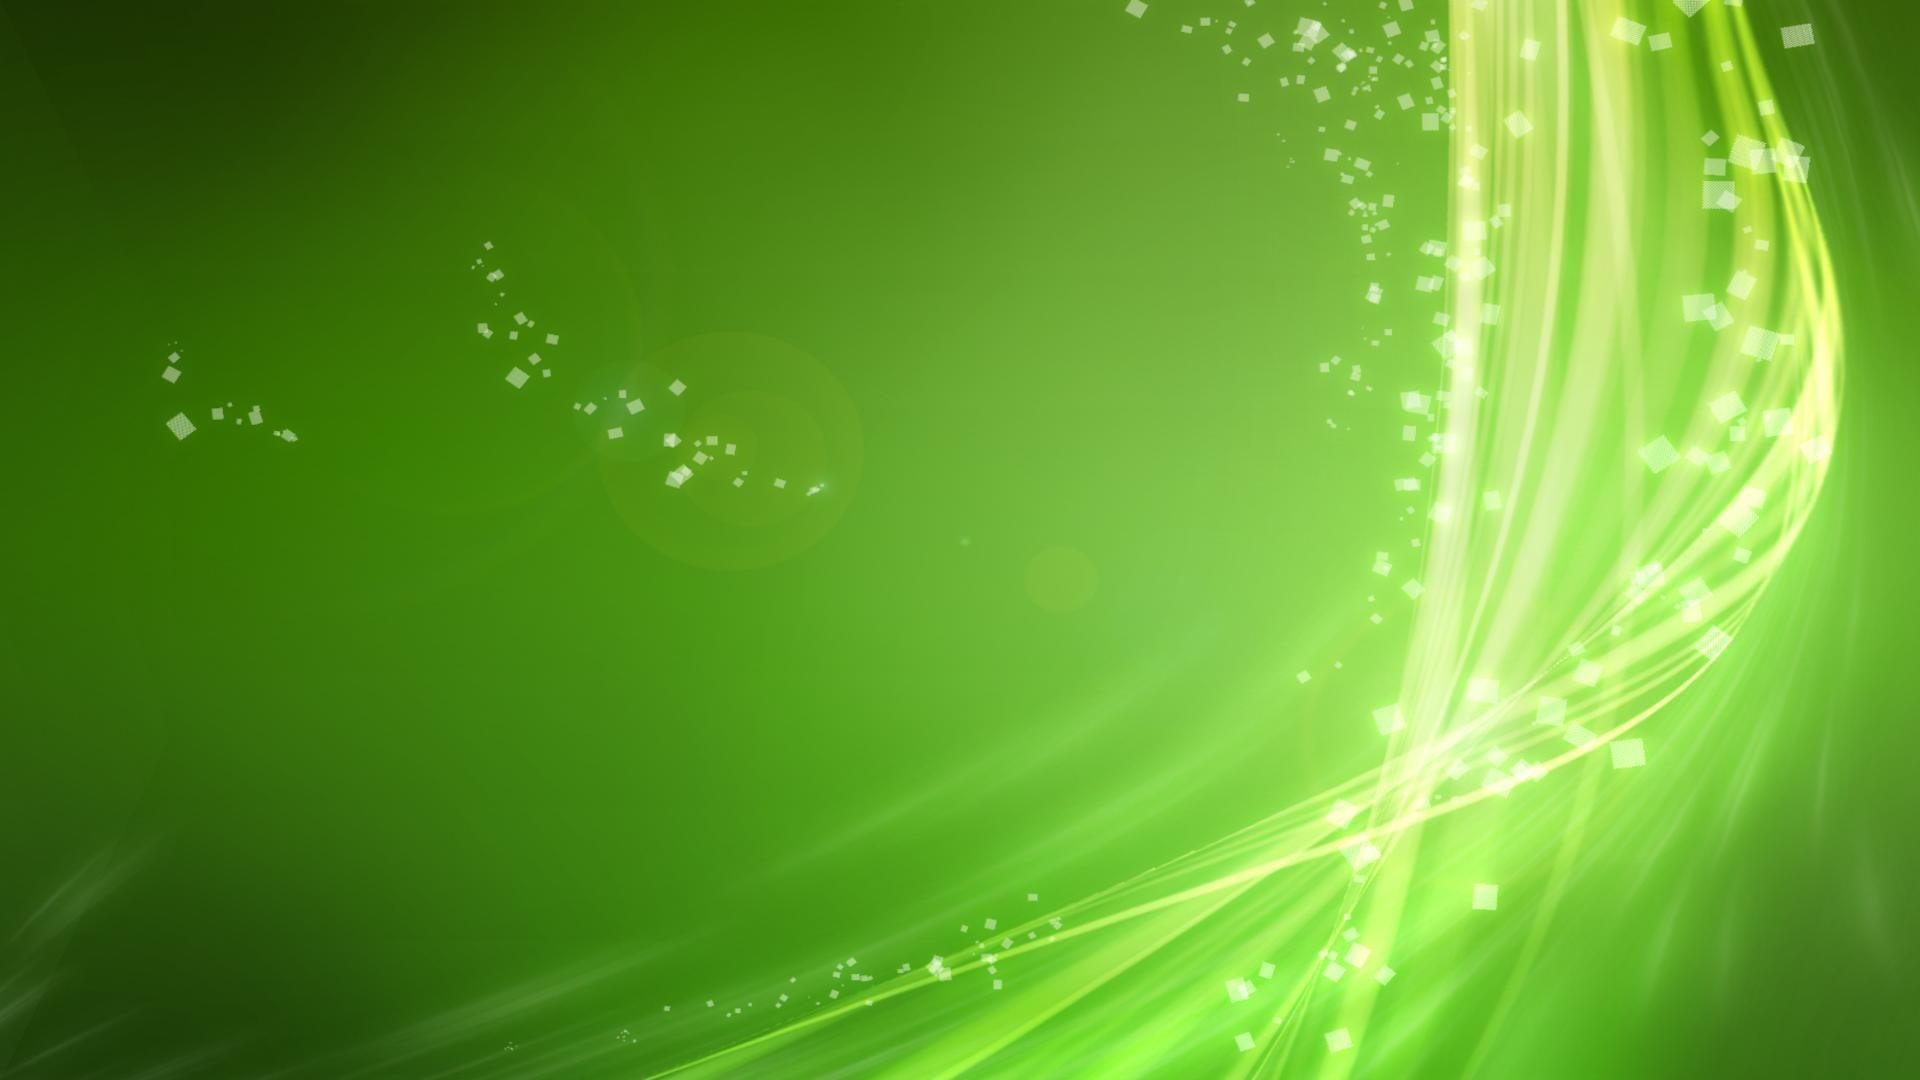 Light Green Abstract Wallpaper For Desktop Background 13 Hd